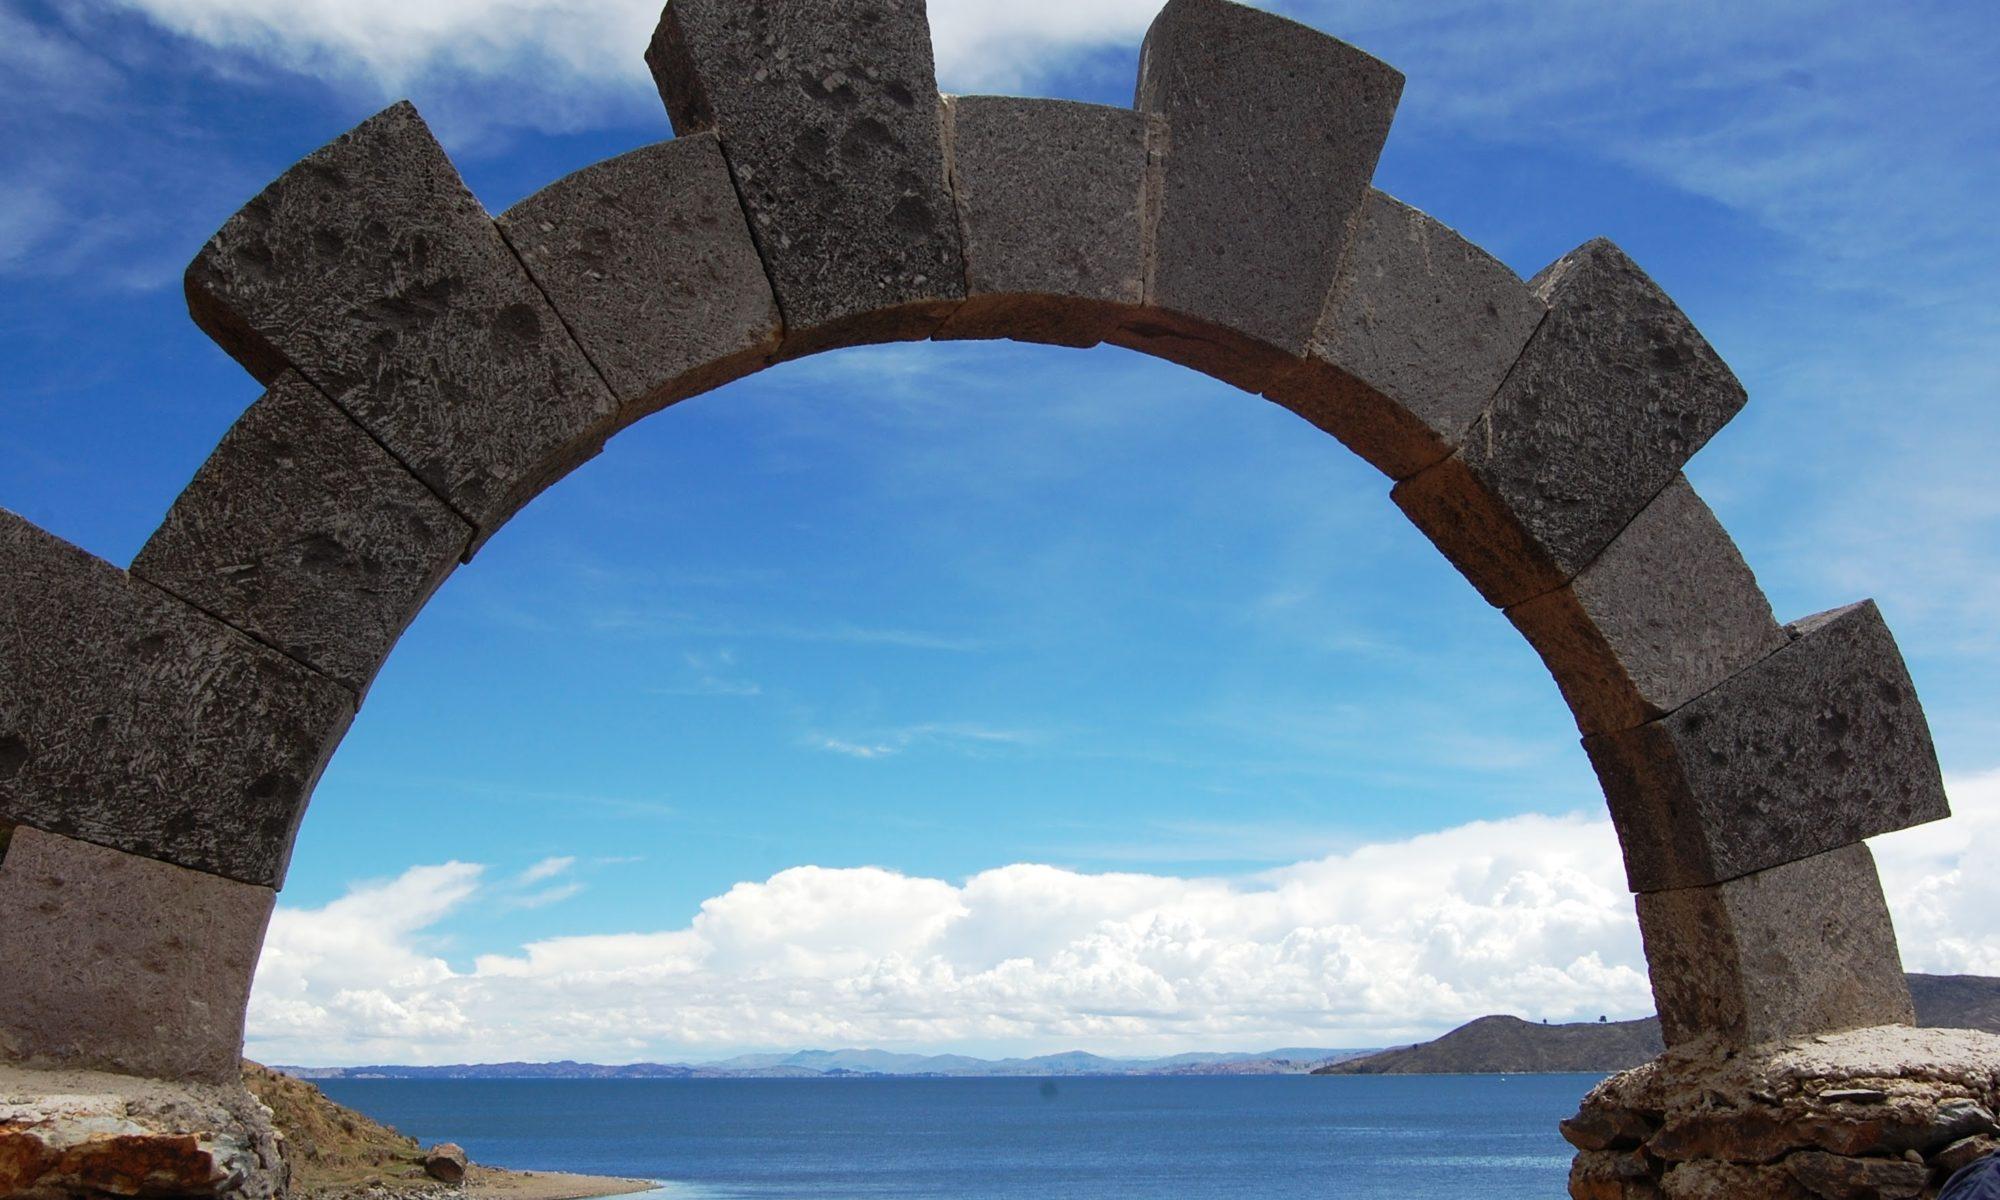 a window on Titicaca lake